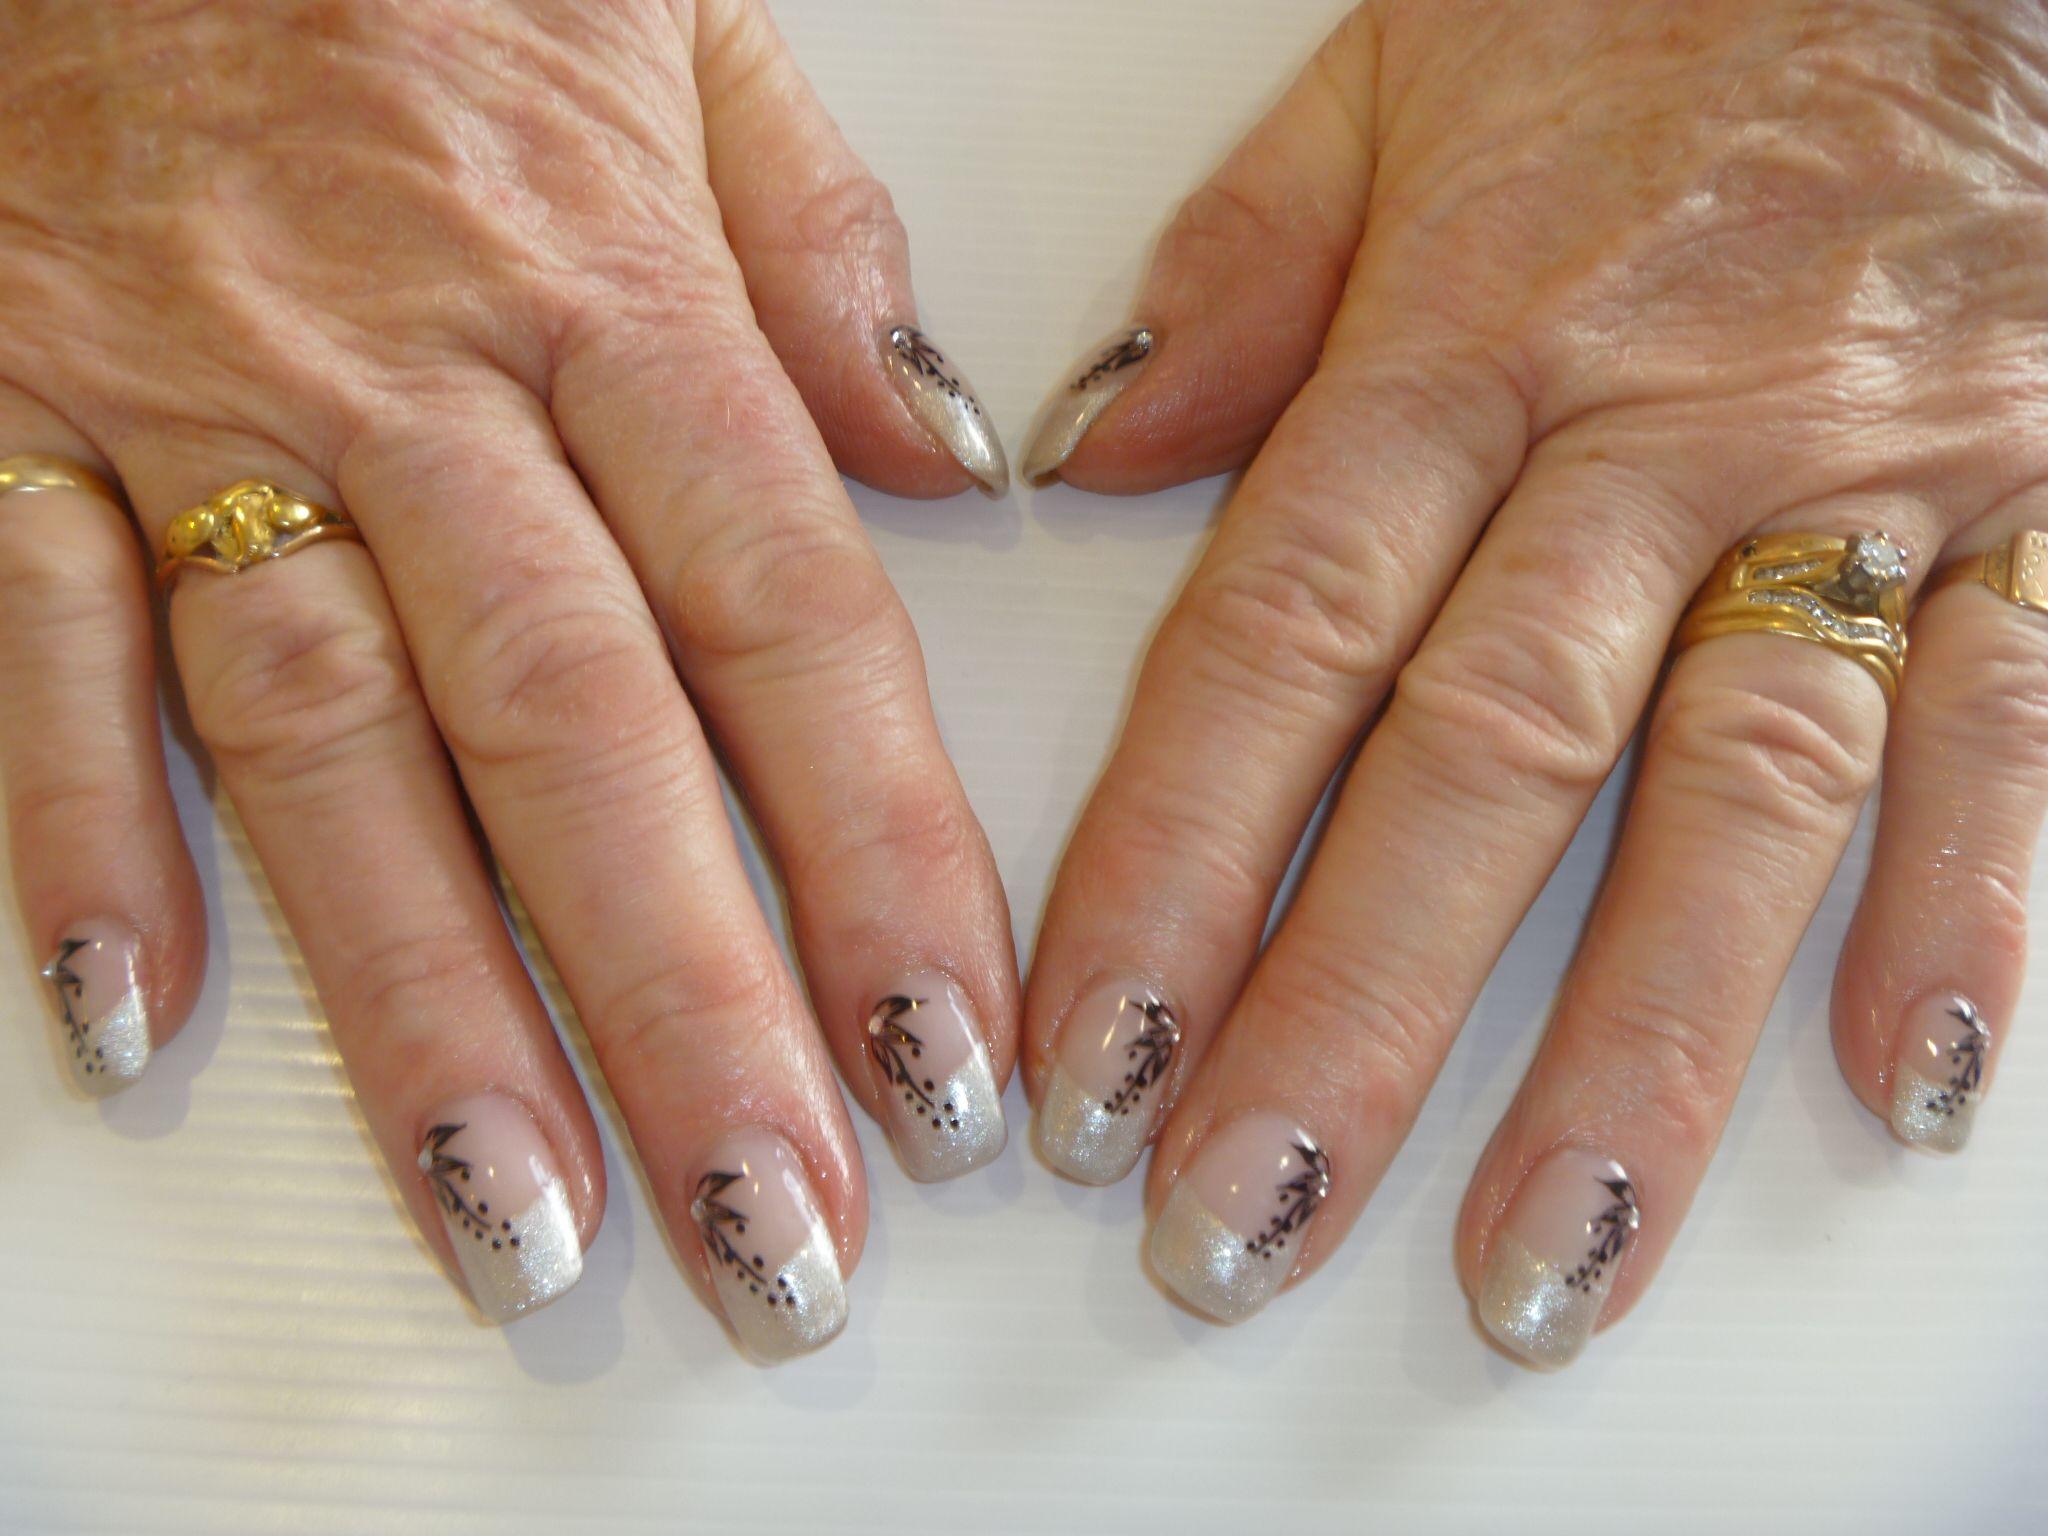 Night Shimmer Gelish gel polish French tips over acrylics